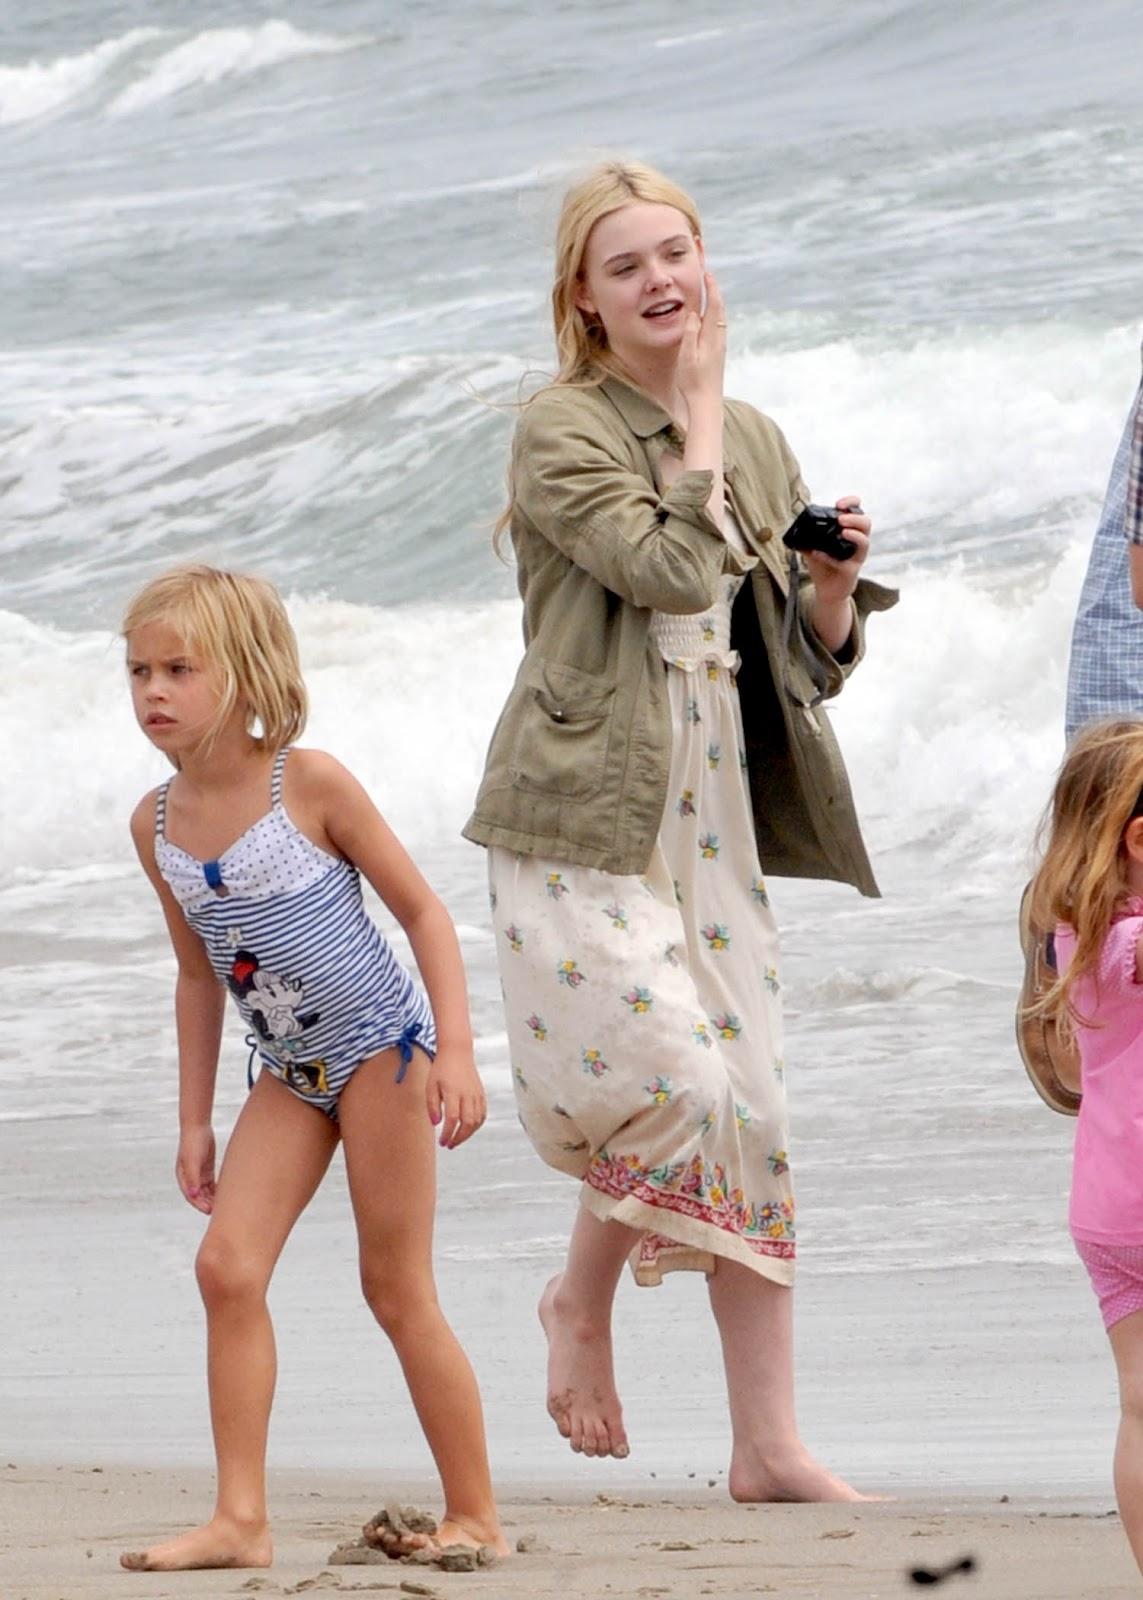 http://1.bp.blogspot.com/-CsjZn4zLDQM/UBxcYOzamrI/AAAAAAAAIuI/fry2_y7BJ2s/s1600/elle+fanning+beach+%284%29+13+june+2011.jpg